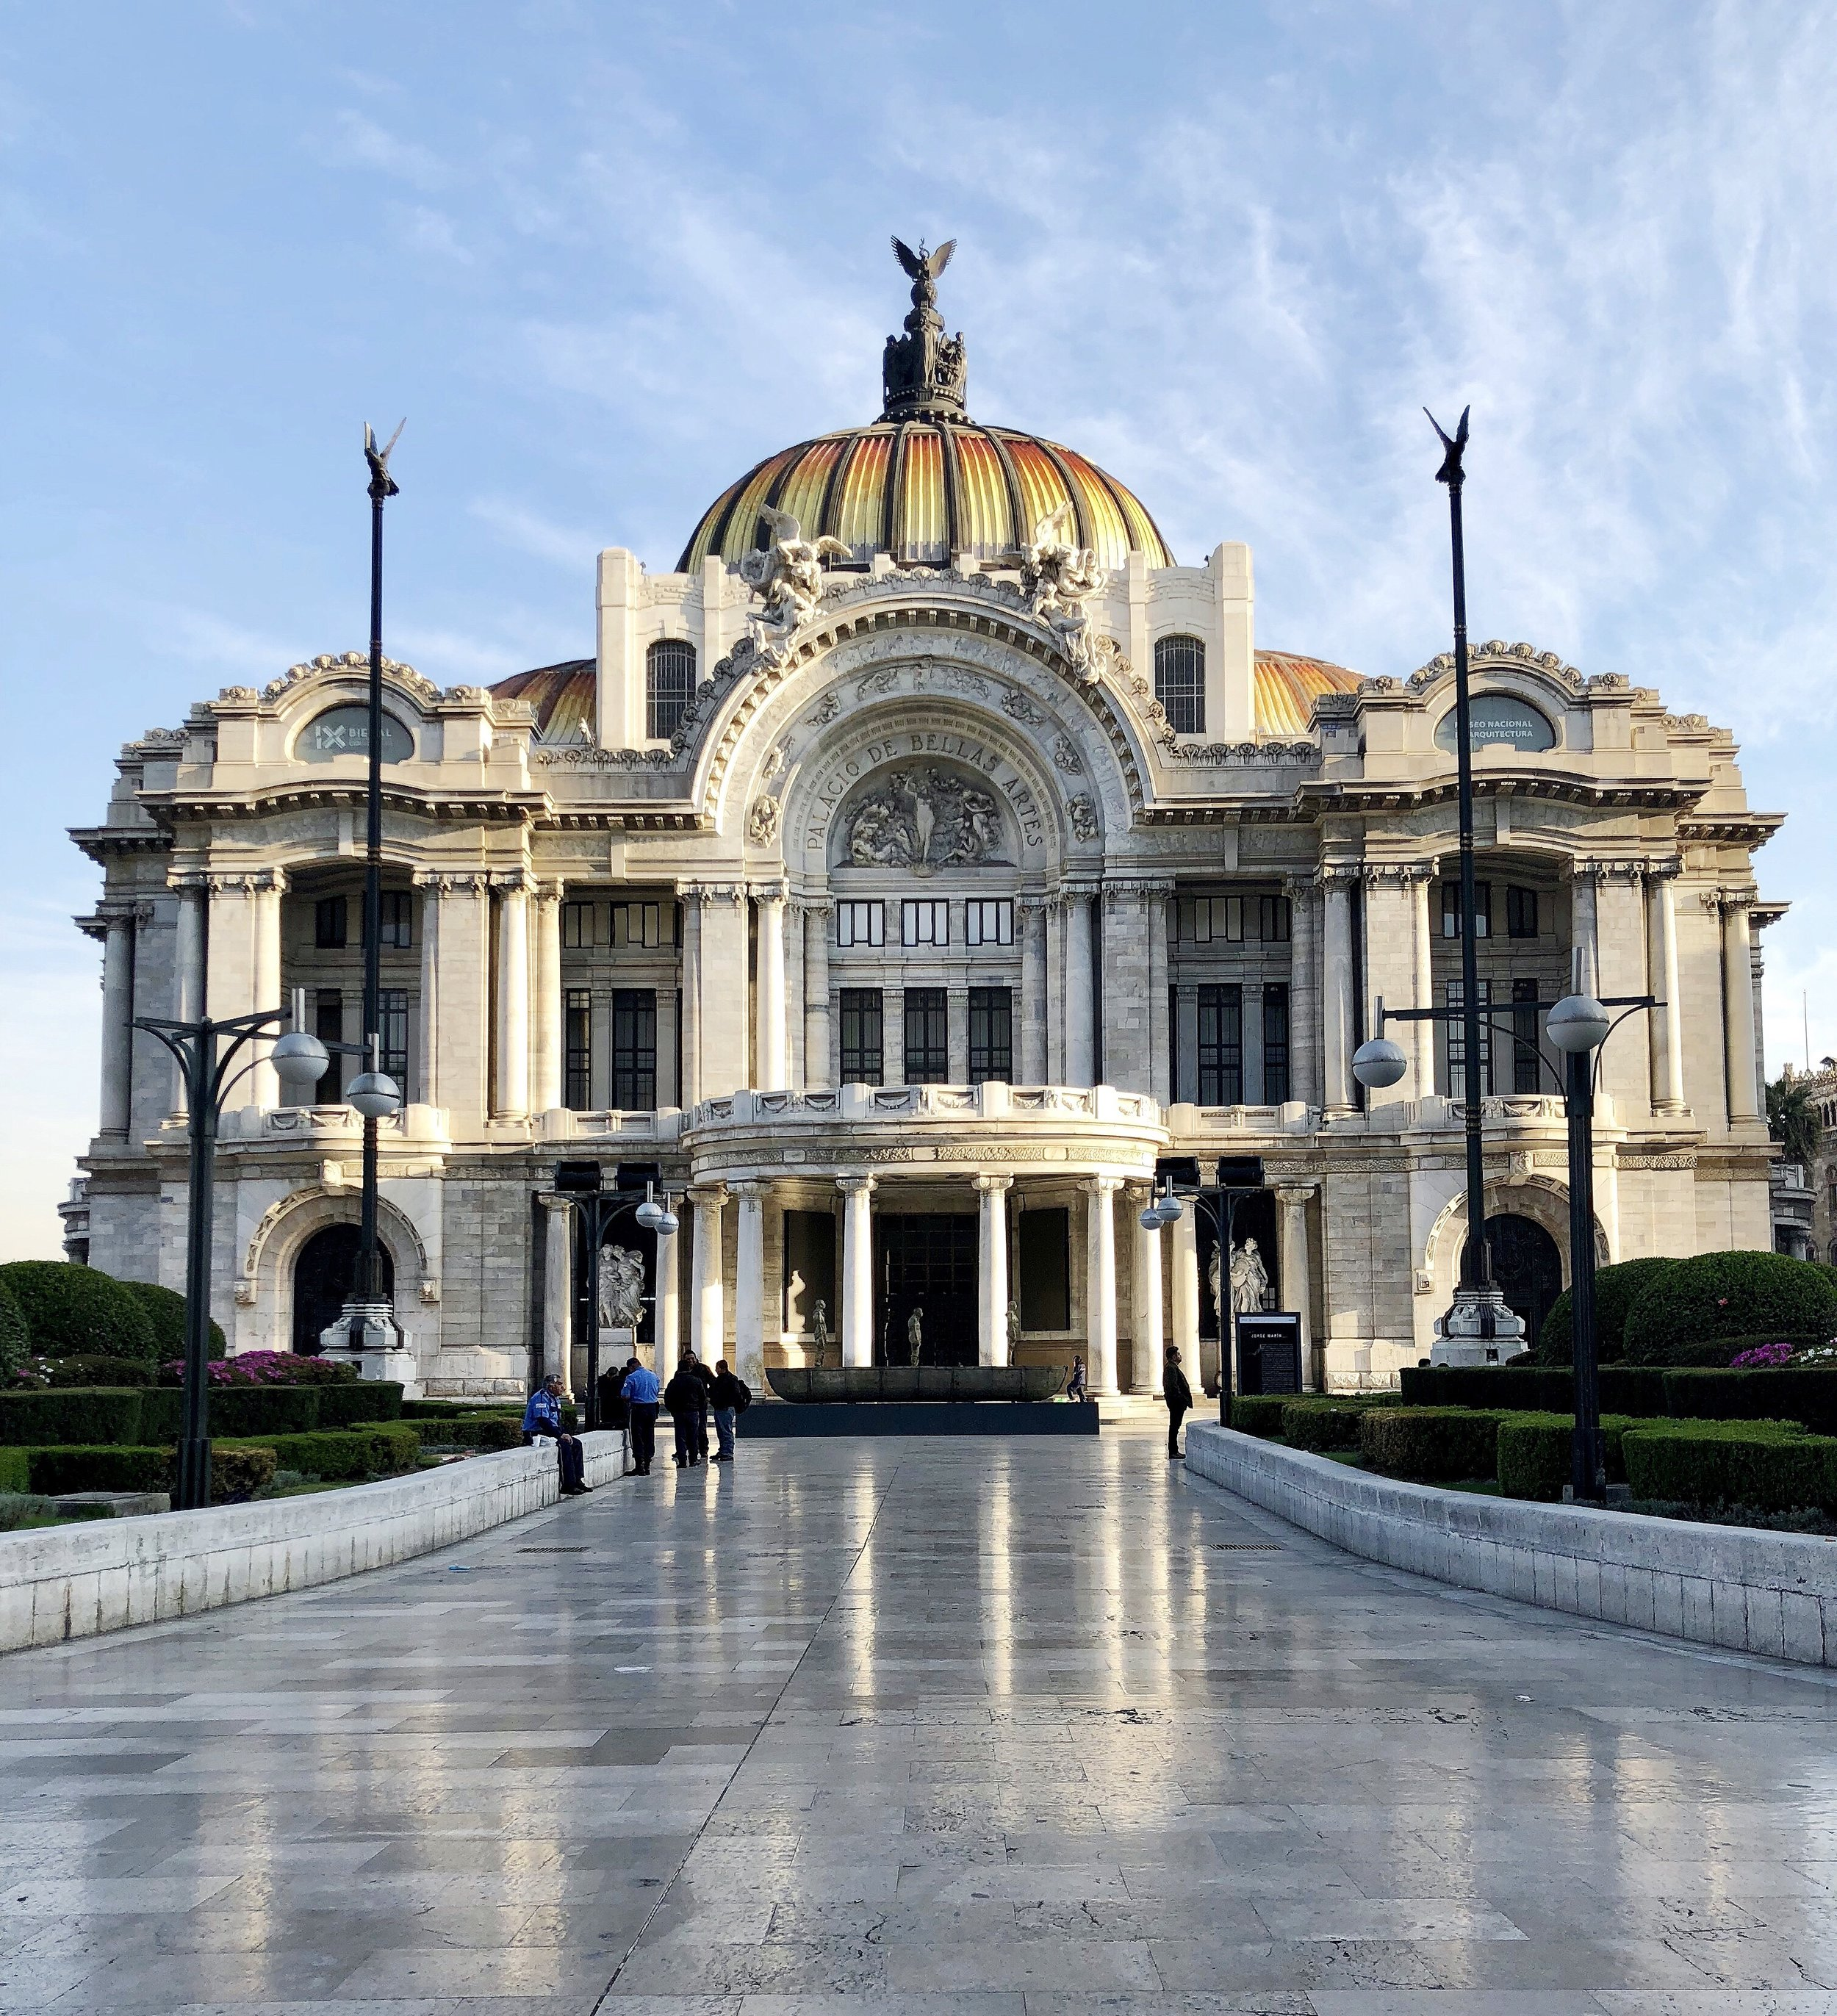 Palacio de Bellas Artes before the mounds of tourists appeared